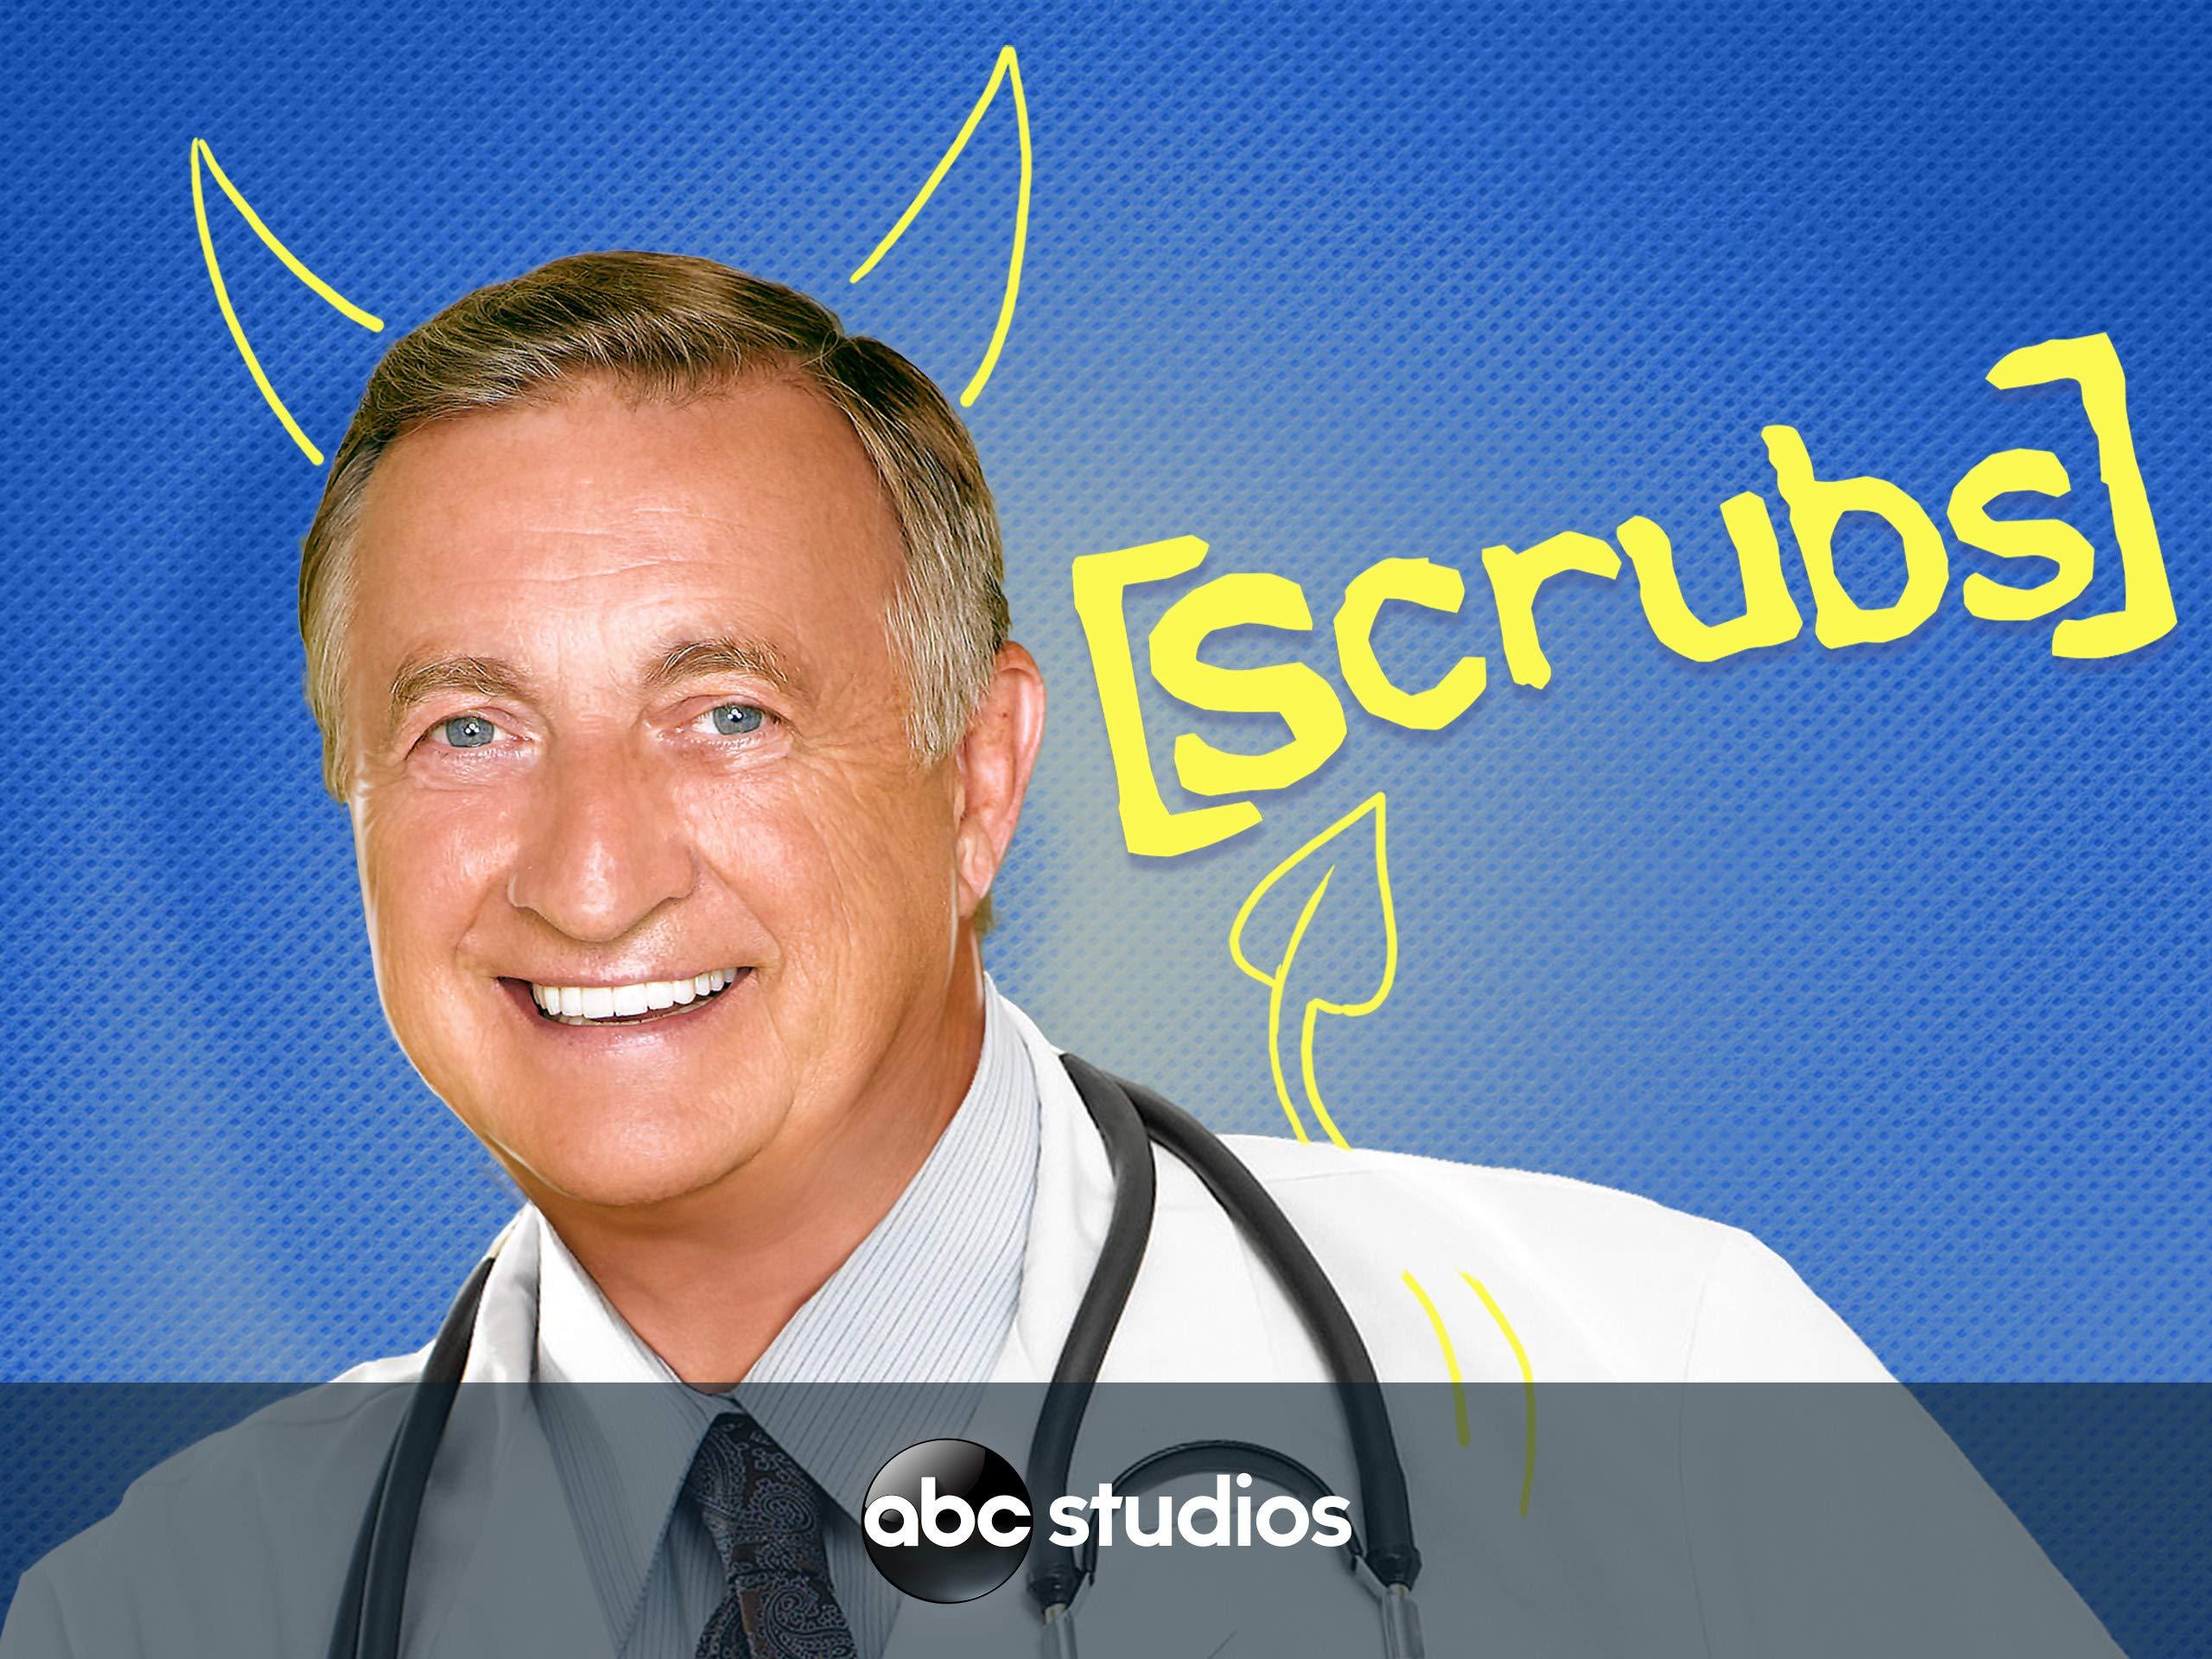 scrubs season 4 torrent download